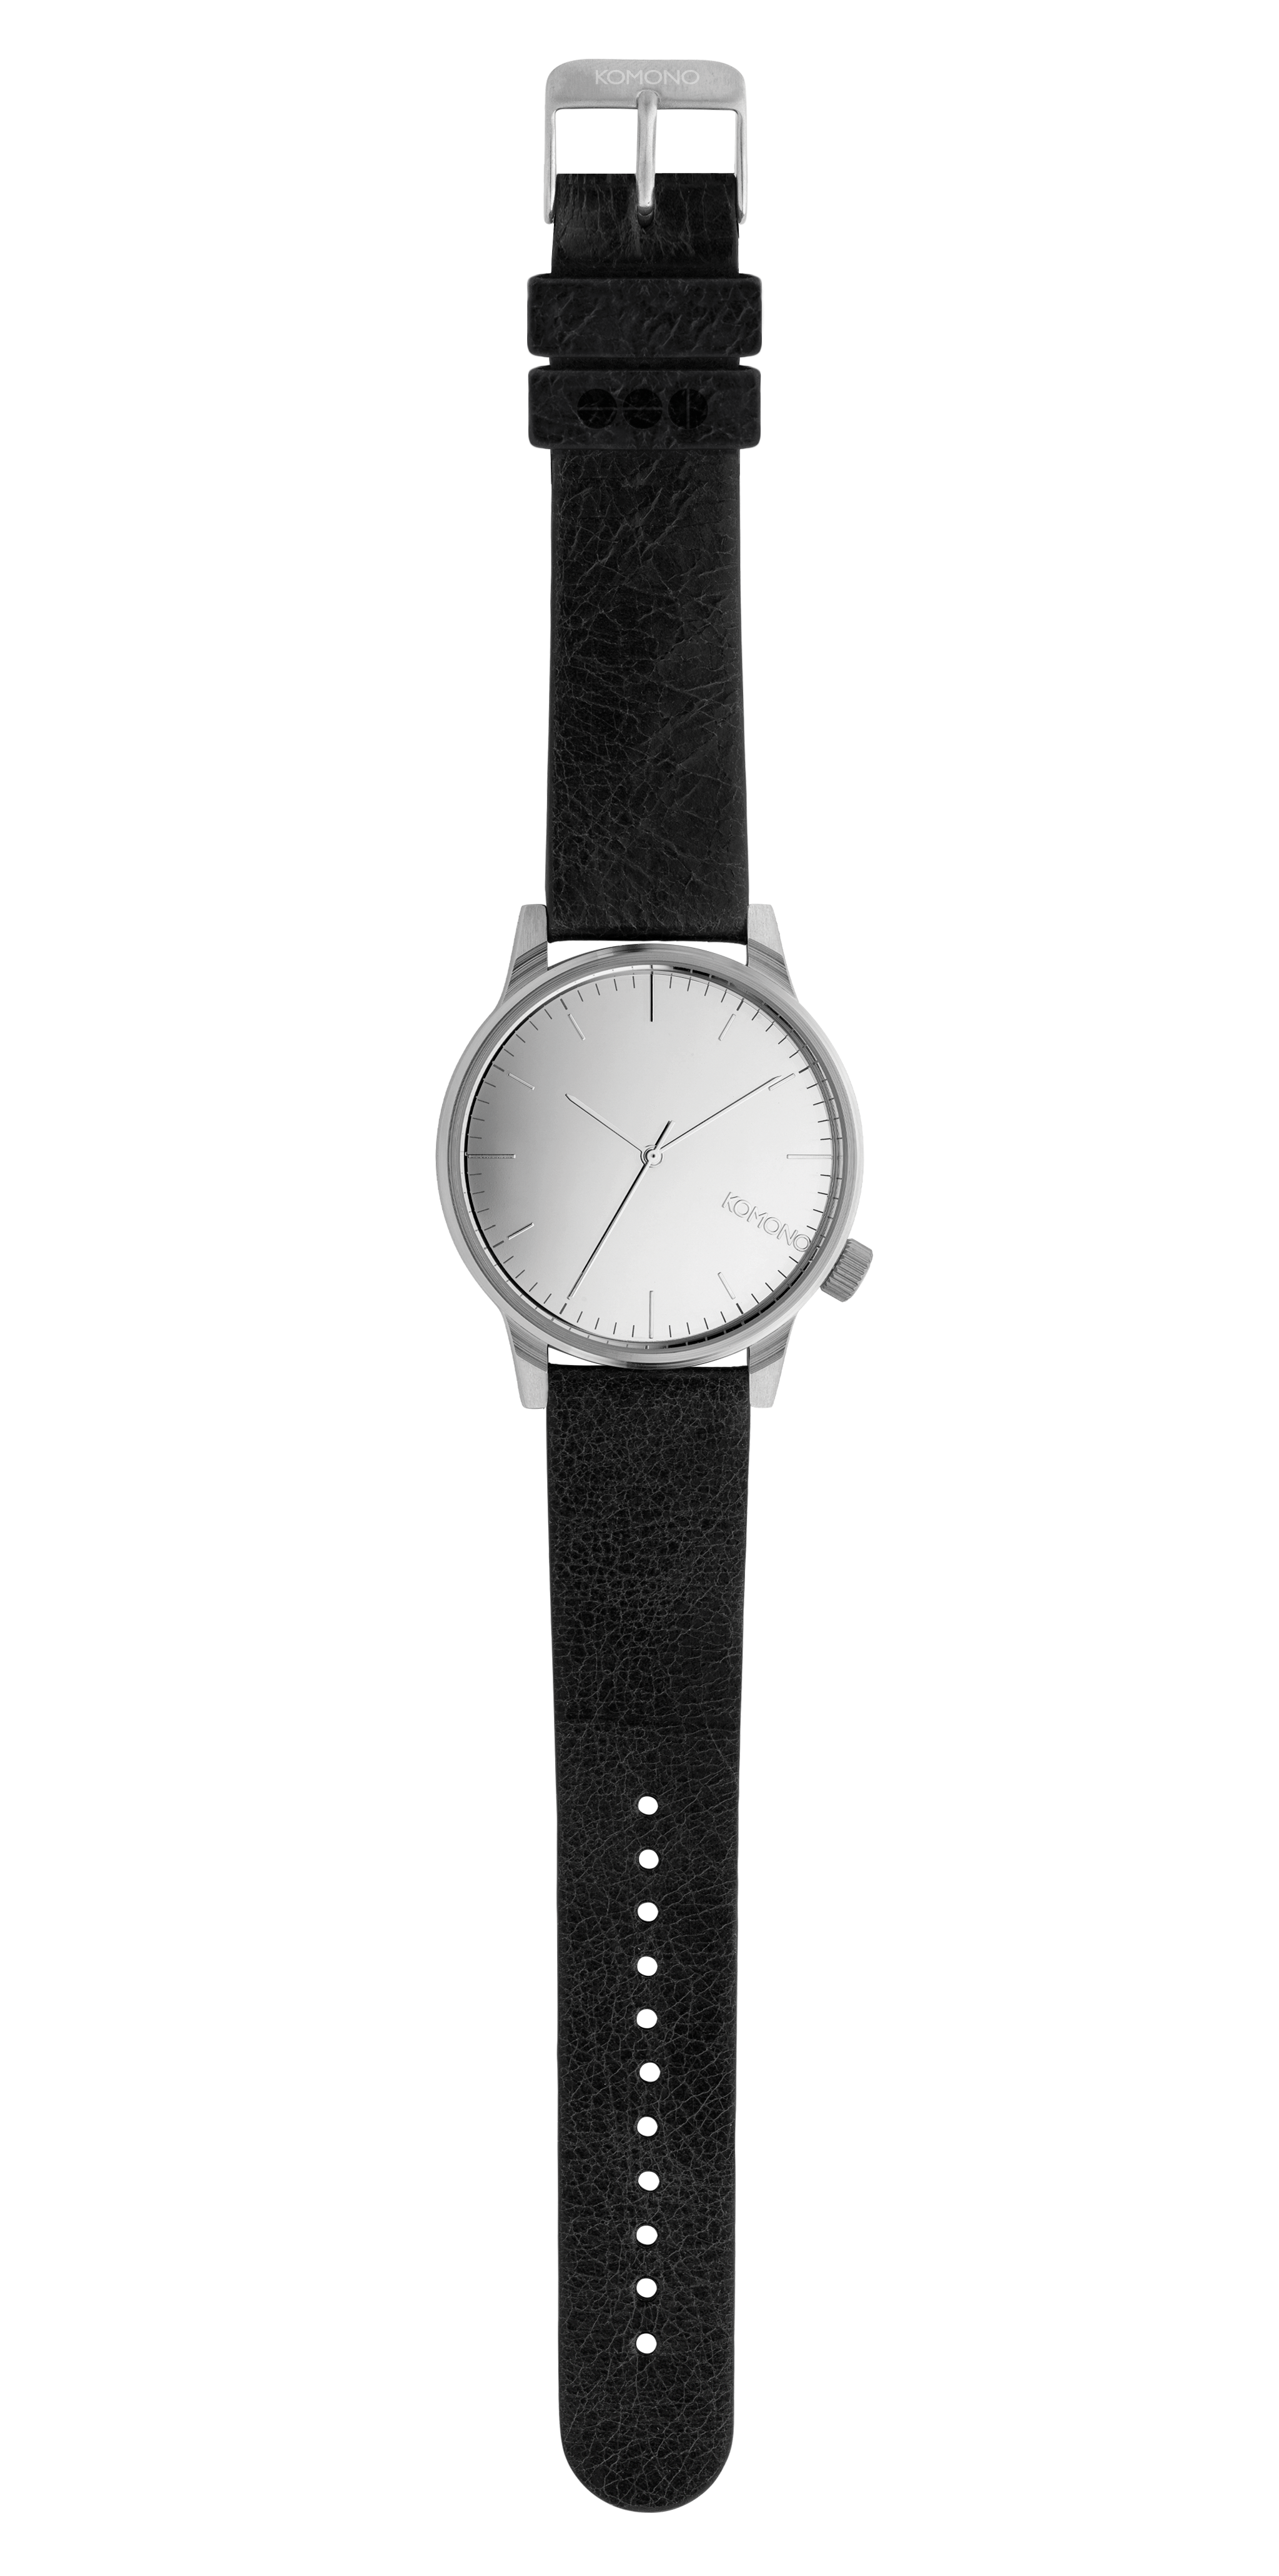 calendrier-avent-komono-watches-sunglasses-folkr-17